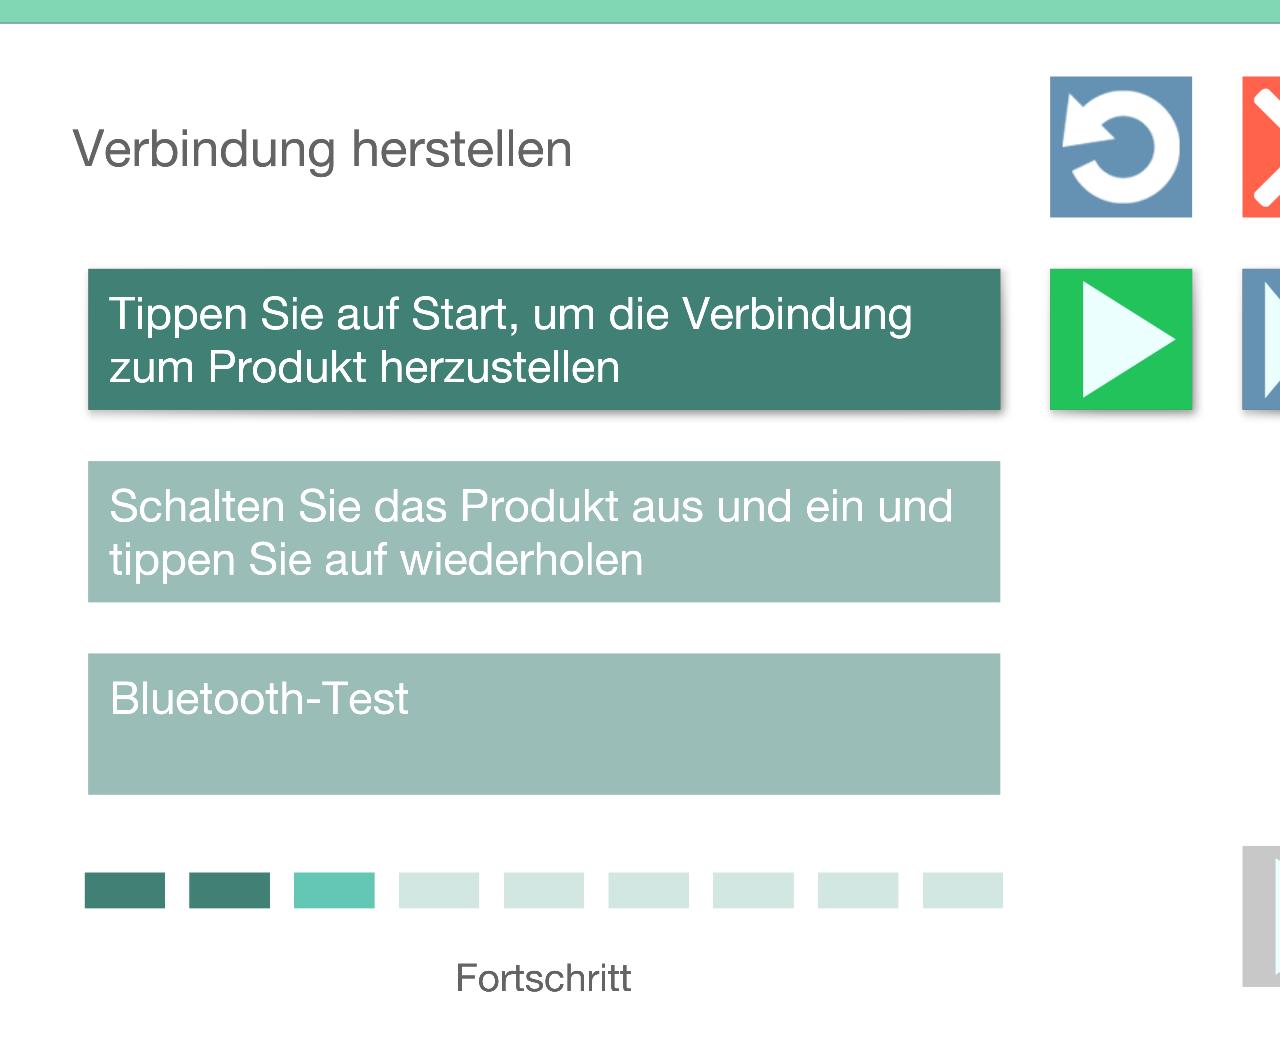 https://triboot.de/wp-content/uploads/2018/04/Triboot-Technologies-Teststation-Bluetooth-Connection-Progress-1280x1040.png